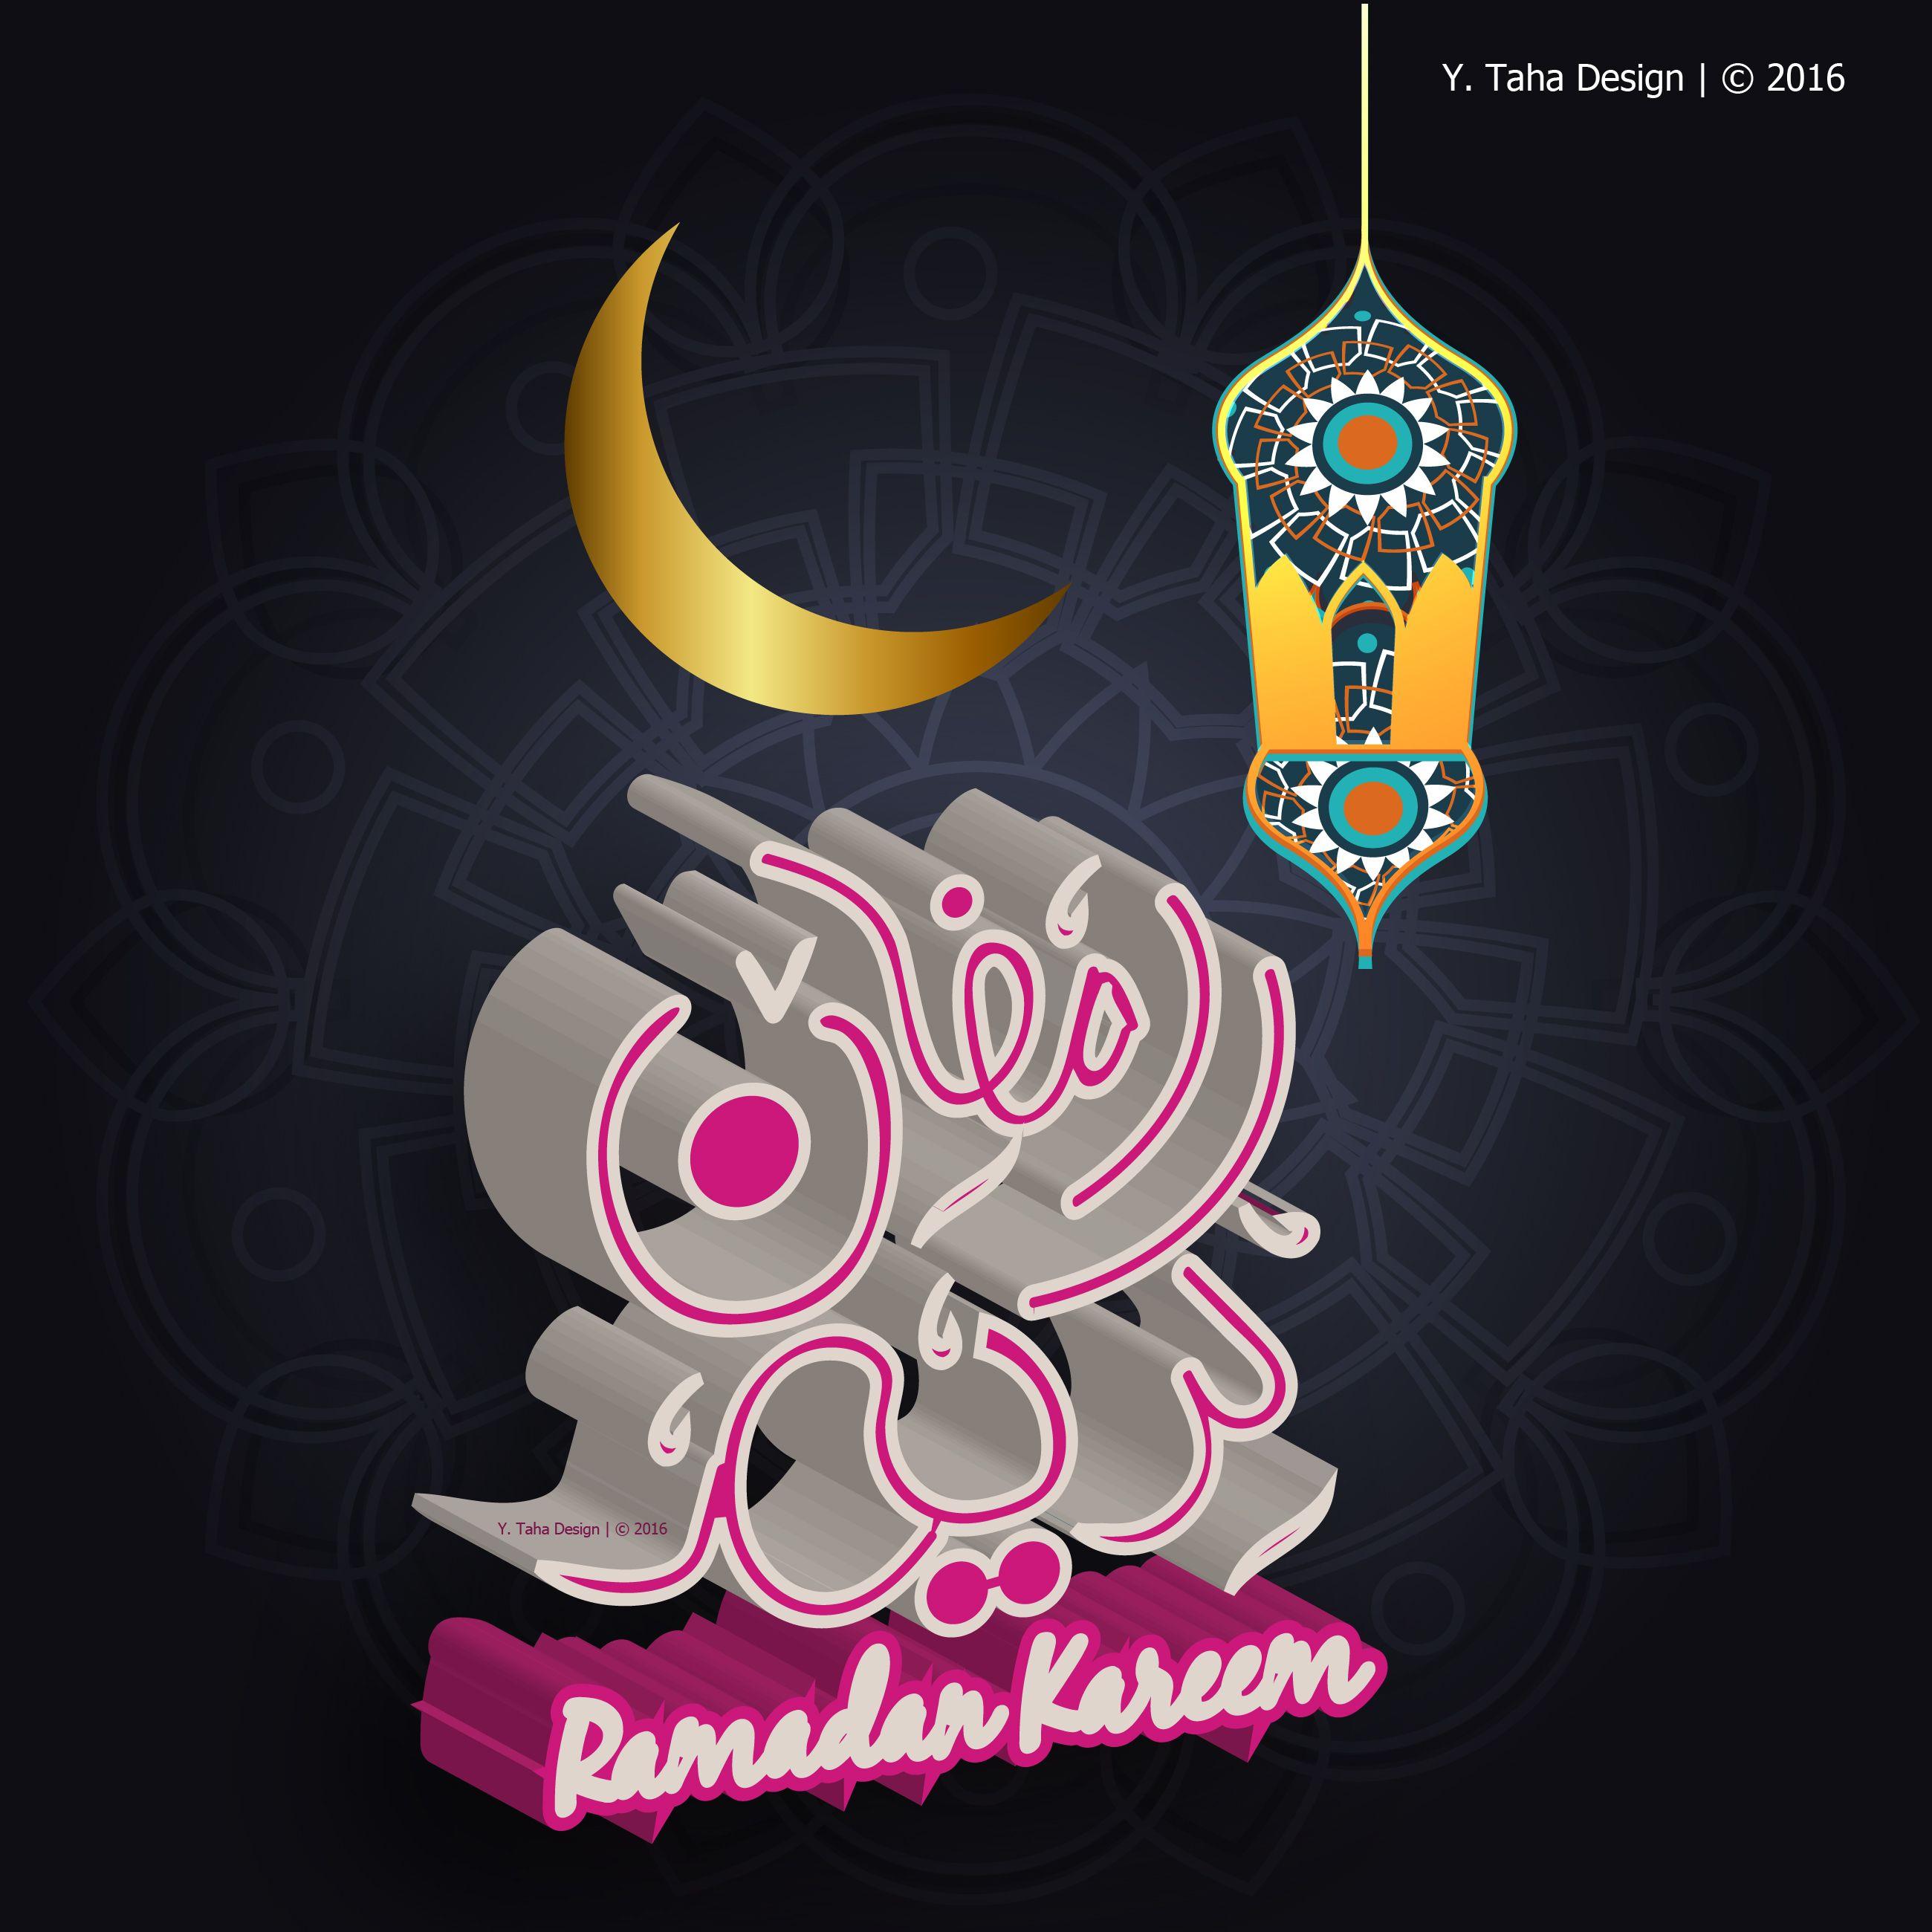 Ramadan Mubarak 2016 كل عام وانتم واحبتكم والامة بالف خير رمضان مبارك علينا وعليكم جميعا Cavaliers Logo Sport Team Logos Cleveland Cavaliers Logo